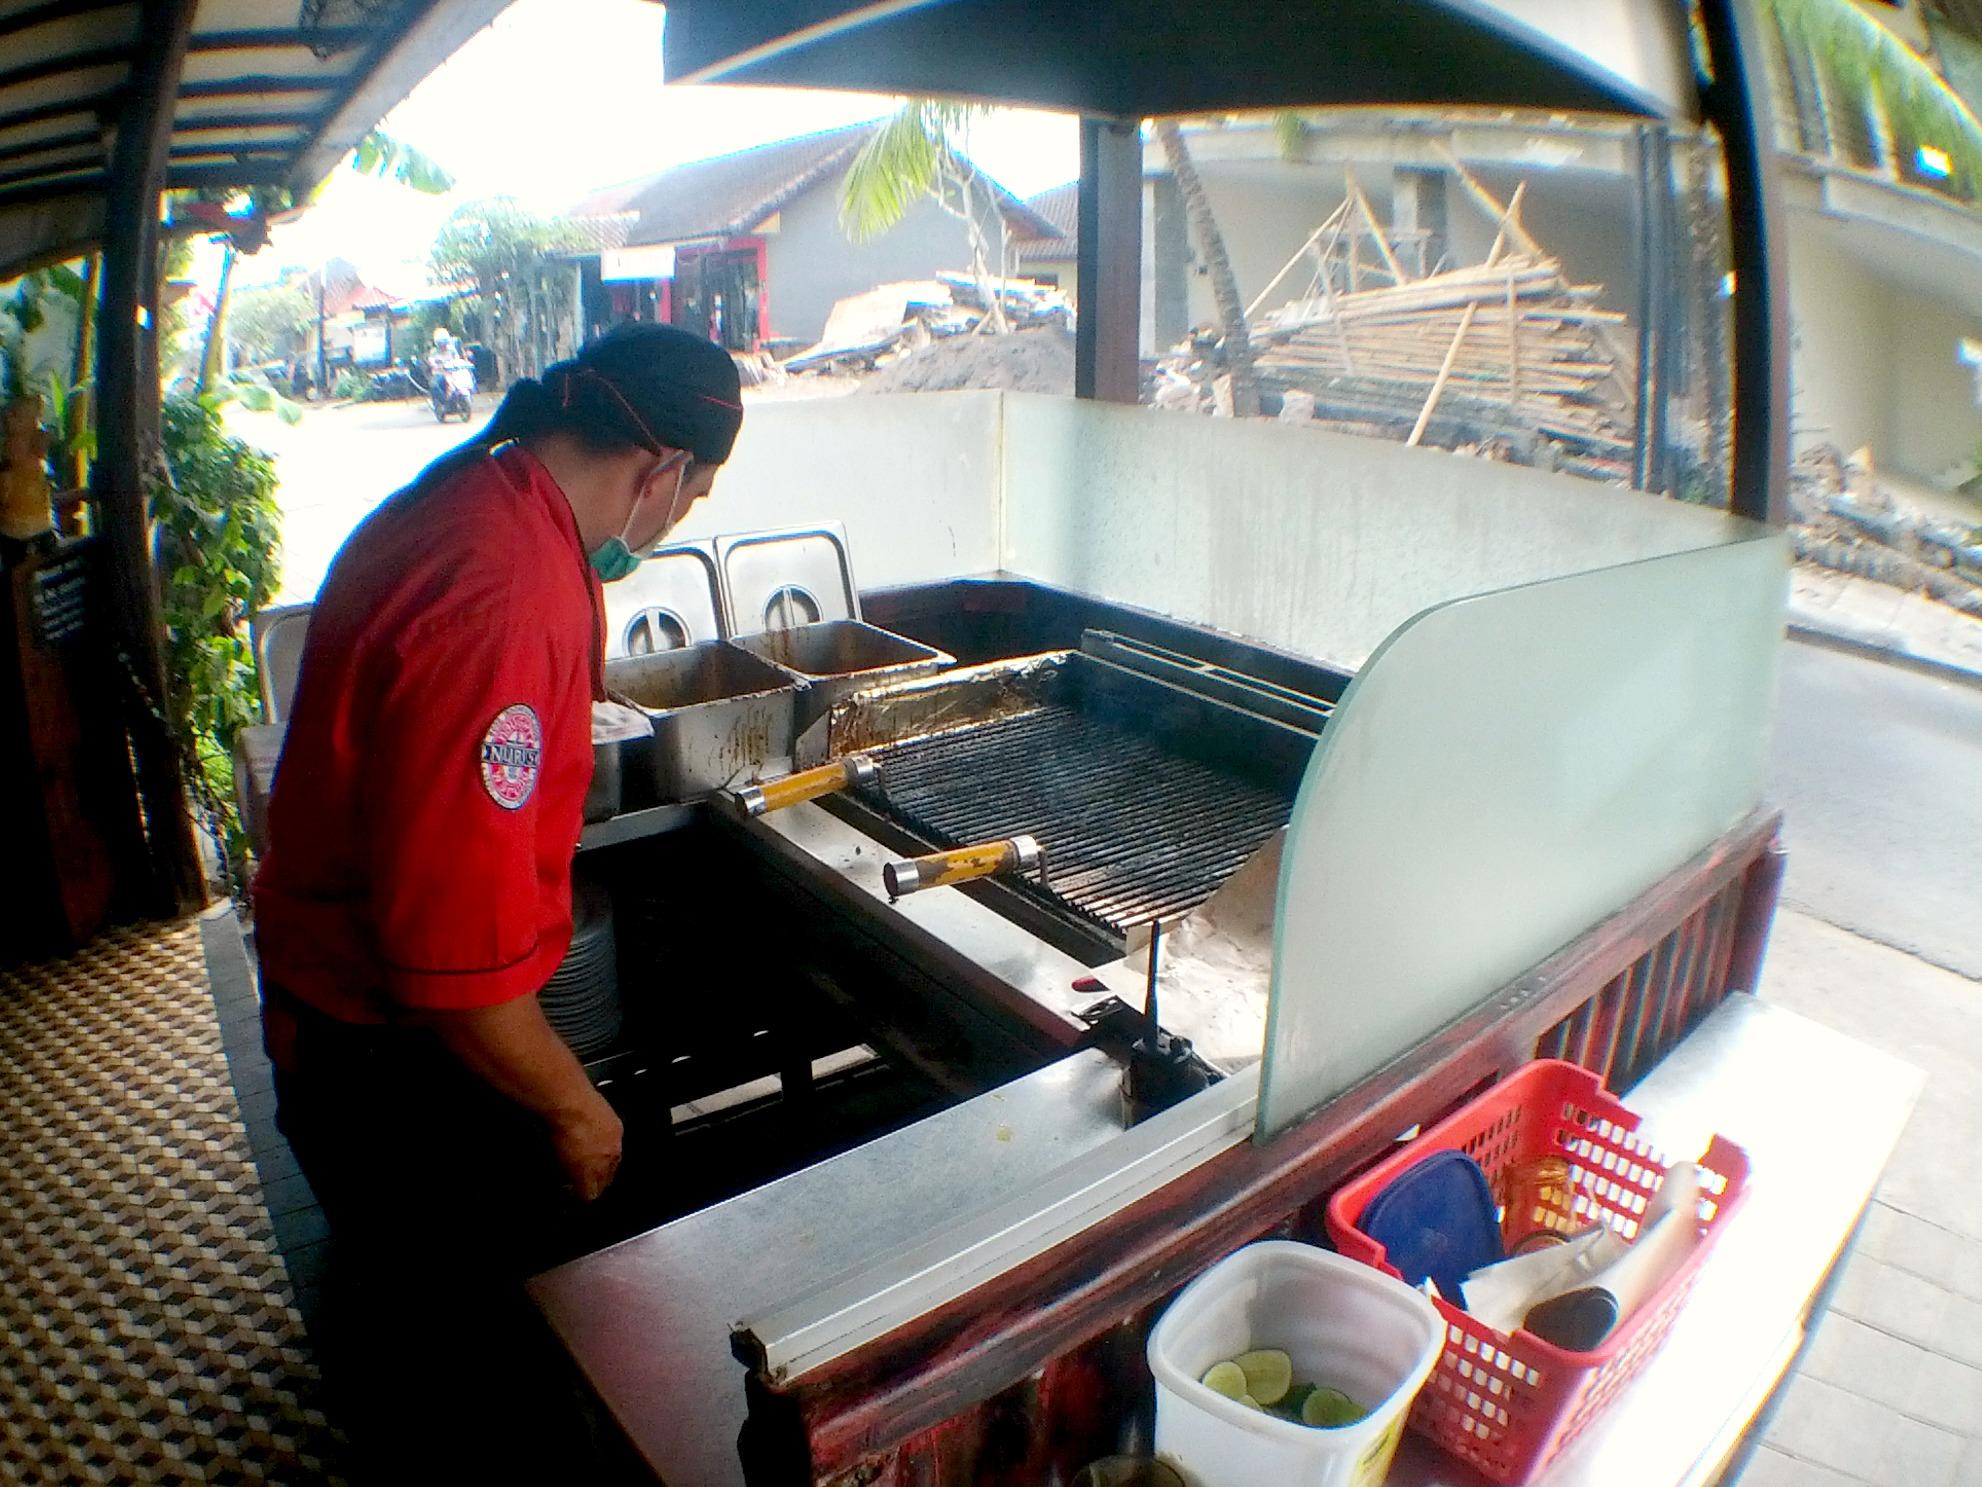 Balinese pork ribs recipe